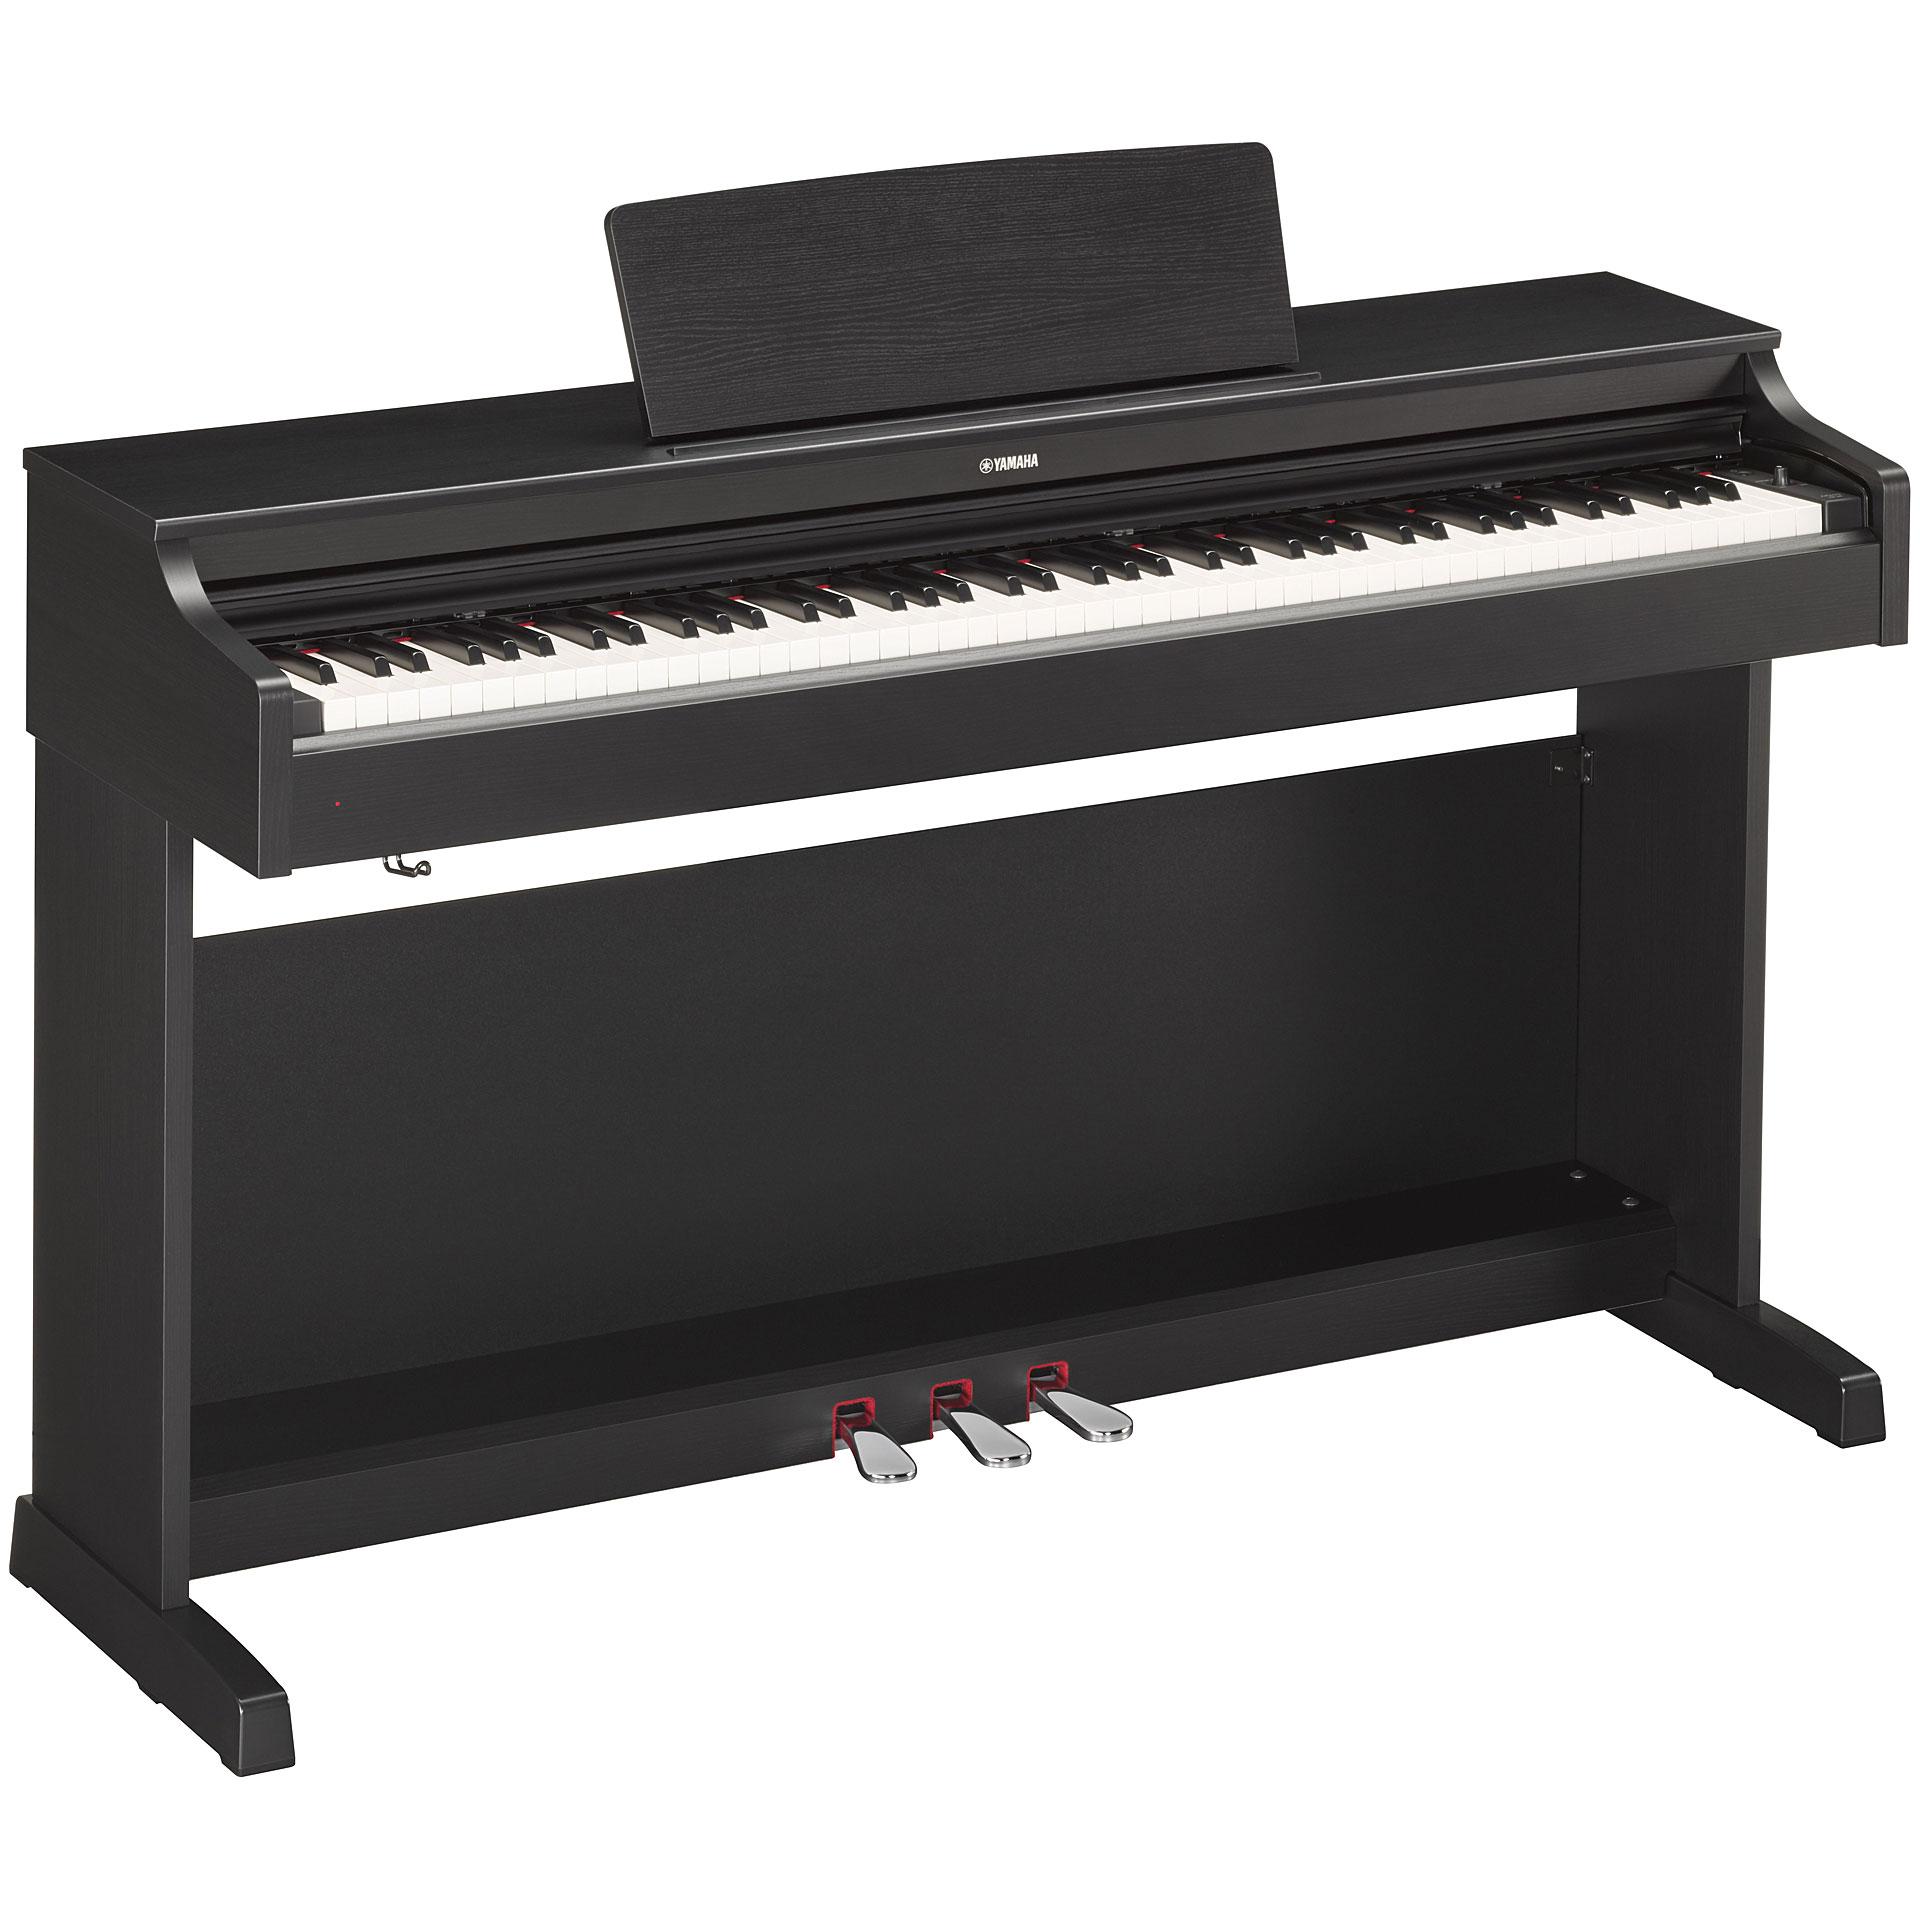 yamaha arius ydp 163 b piano num rique. Black Bedroom Furniture Sets. Home Design Ideas